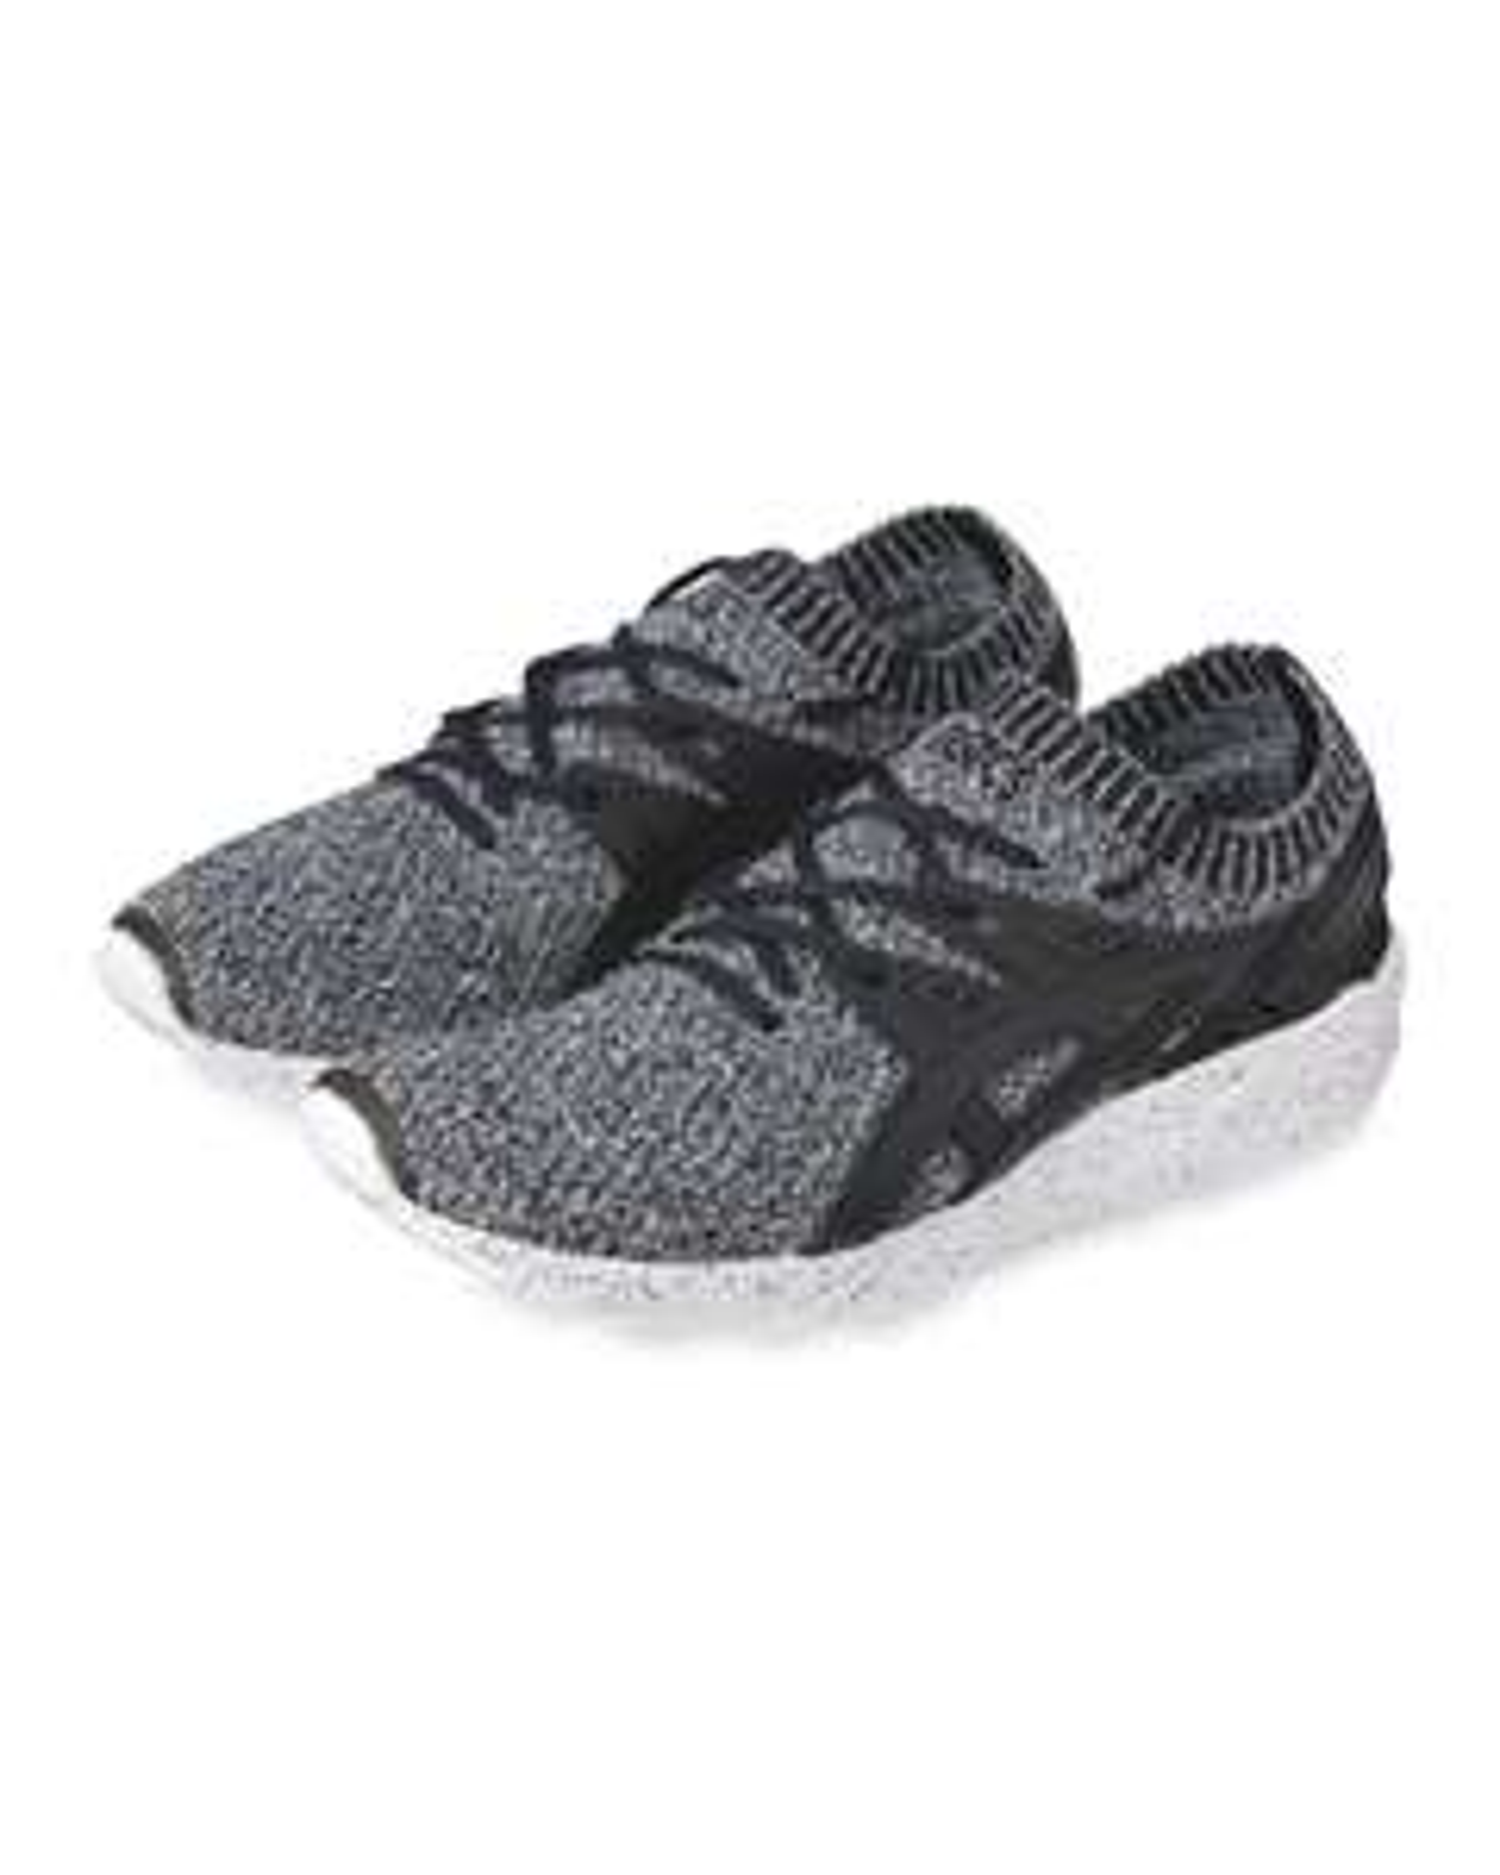 Asics Unisex Gel-Kayano Knit Trainers £33 @ Aldi online